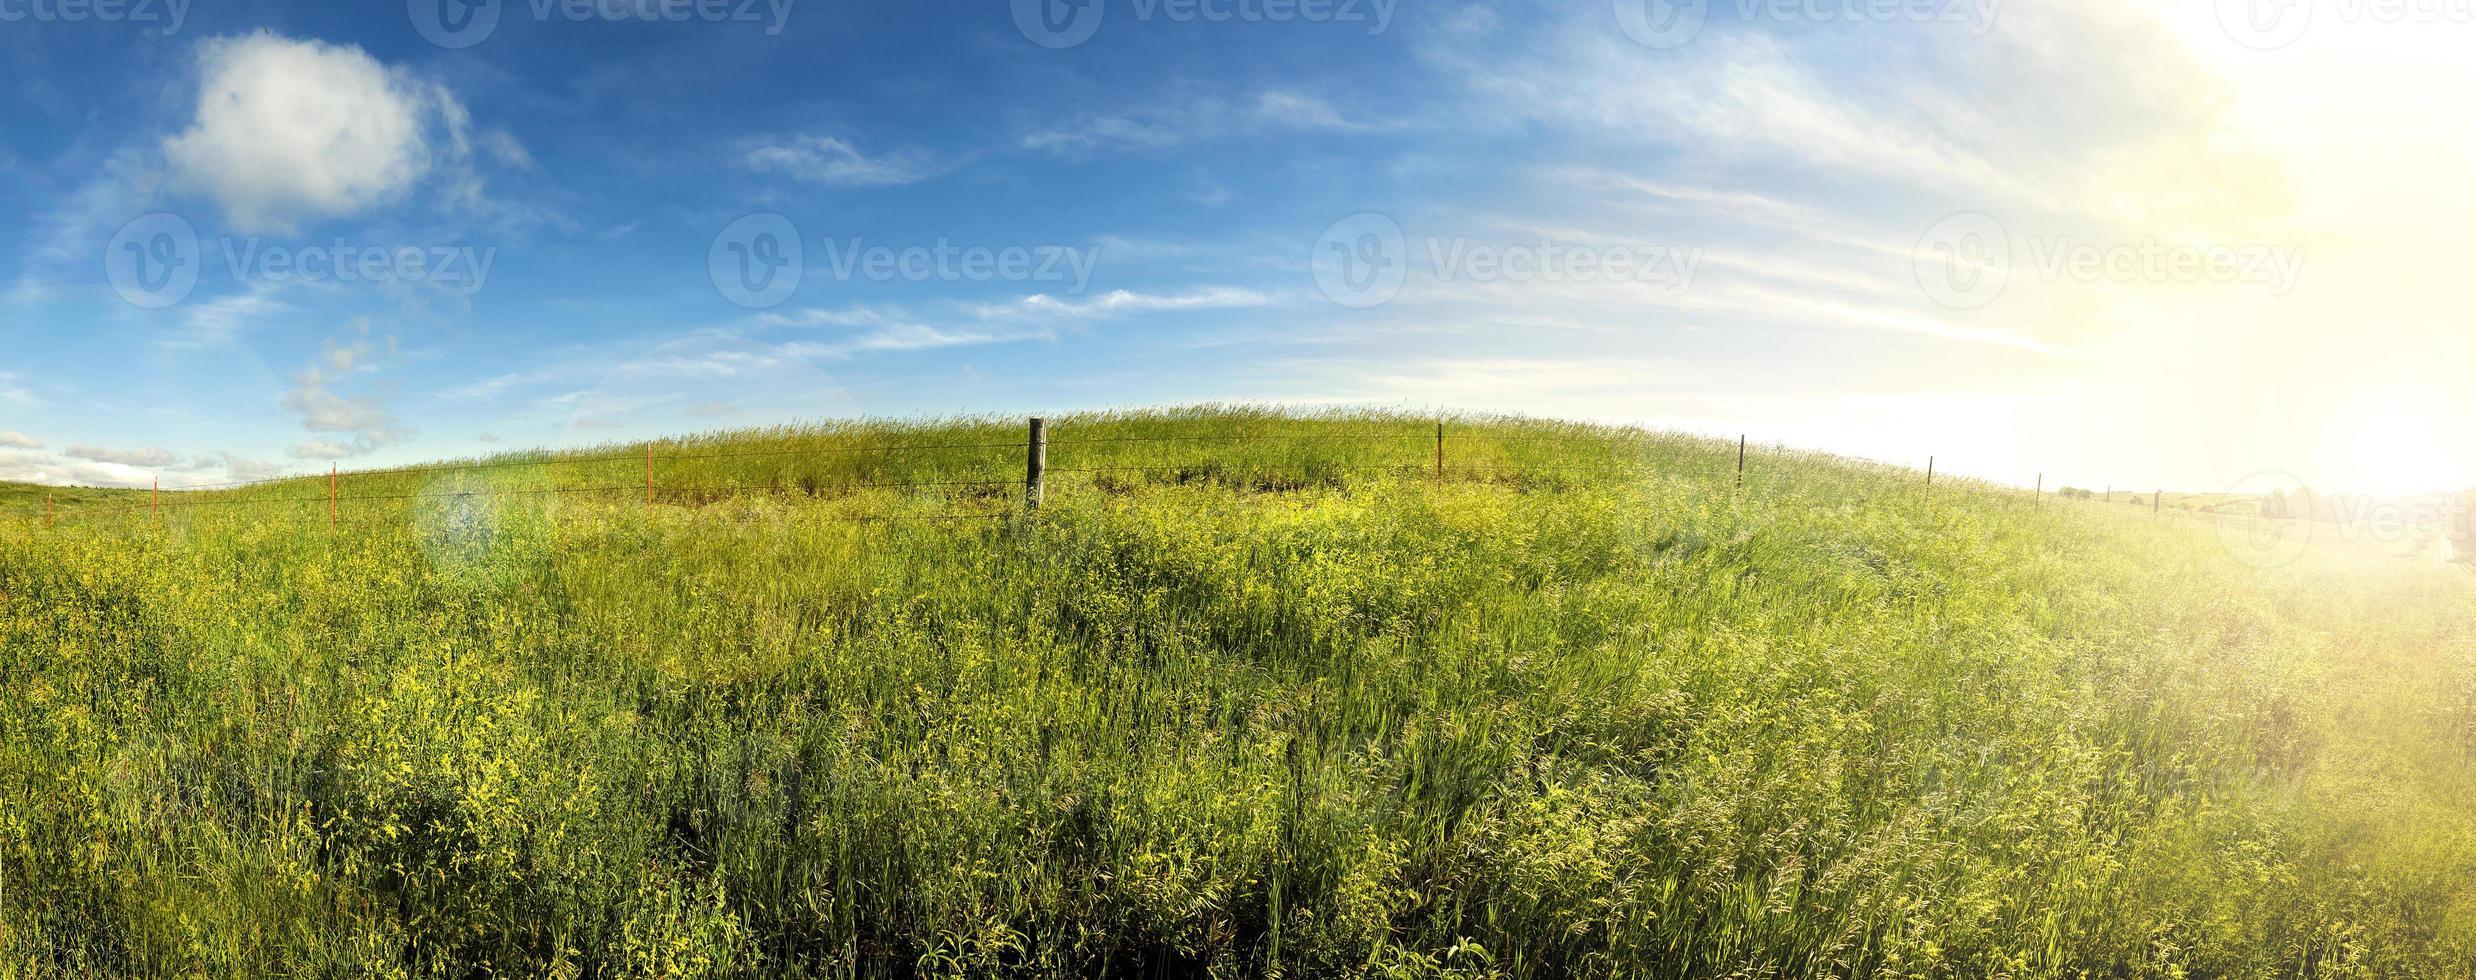 Sommertage, Sonnenaufgang auf South Dakota Grasland. foto